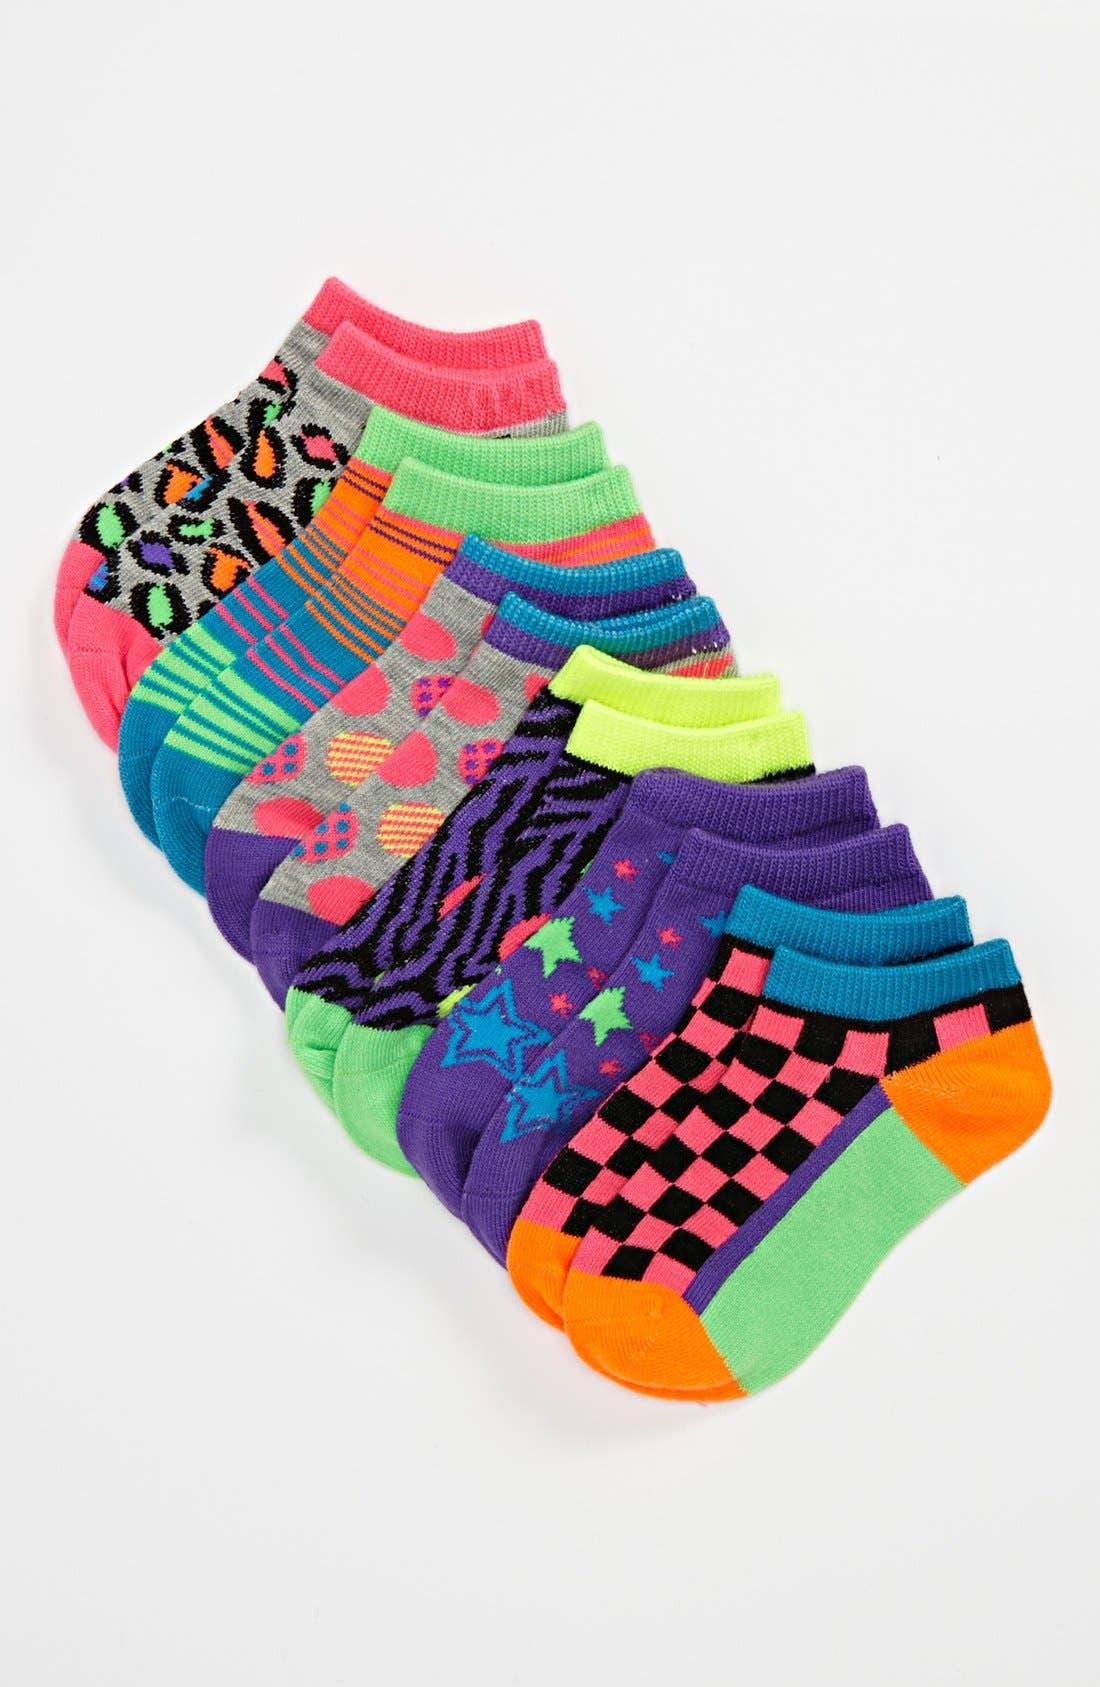 Main Image - Nordstrom Low Cut Socks (6-Pack)(Toddler, Little Girls & Big Girls)